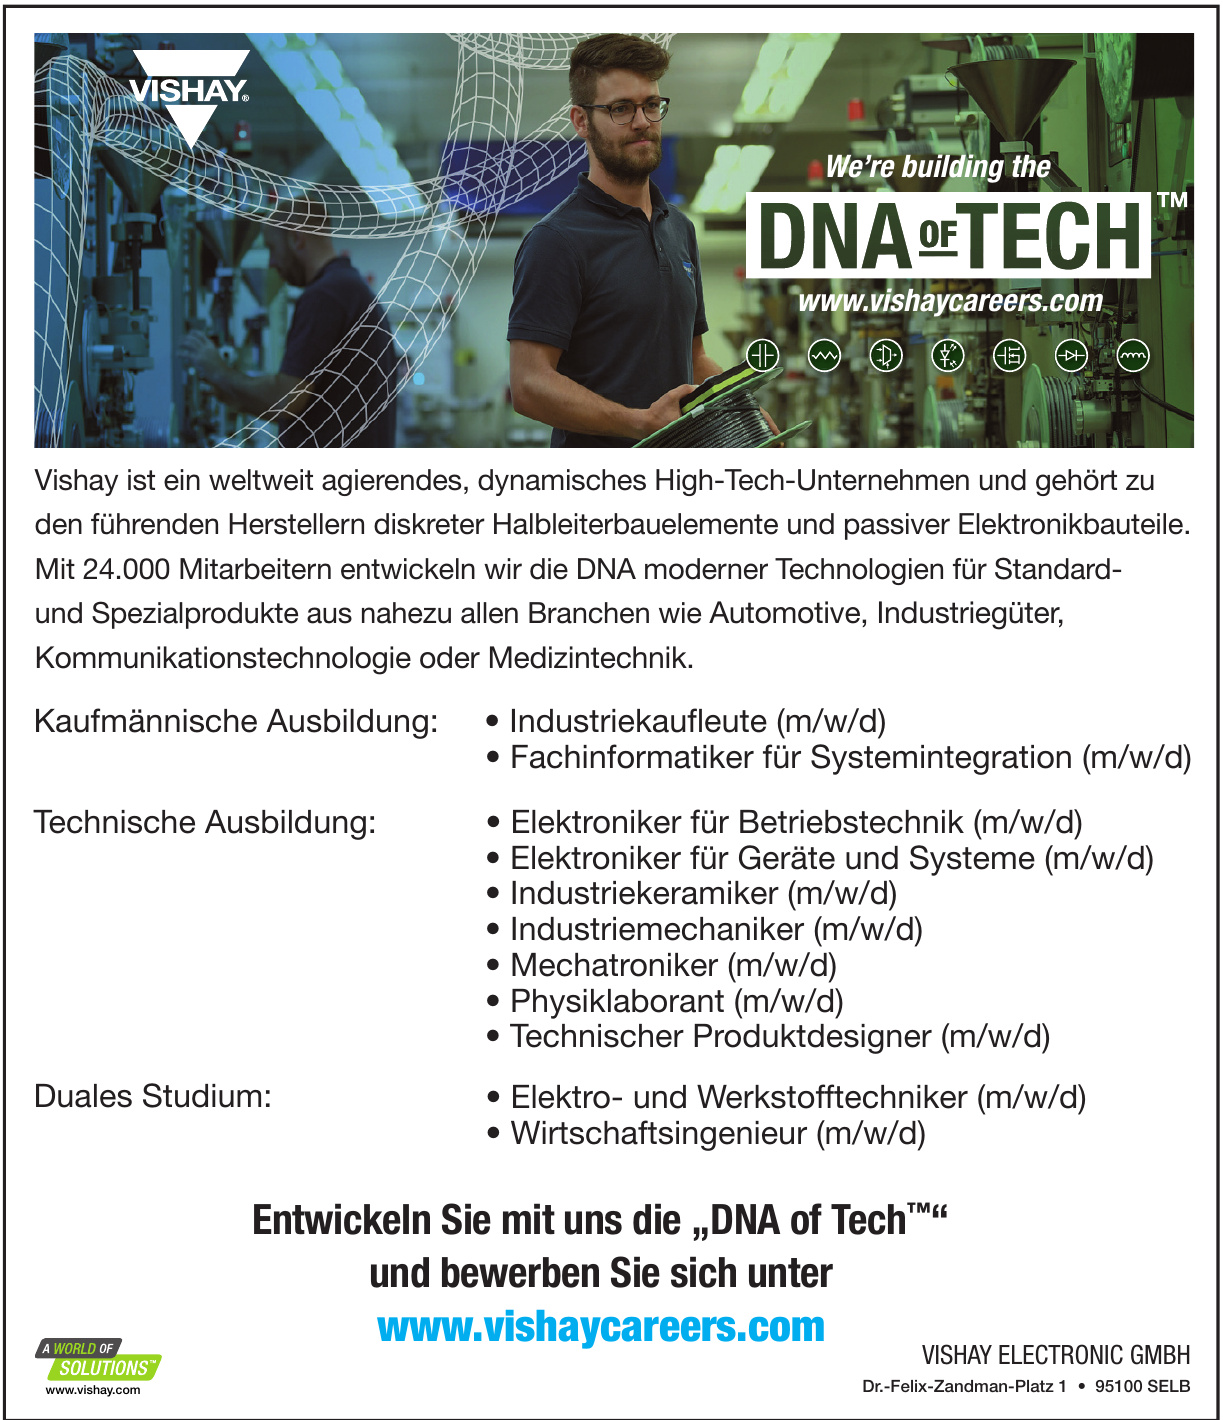 Vishay Electronic GmbH